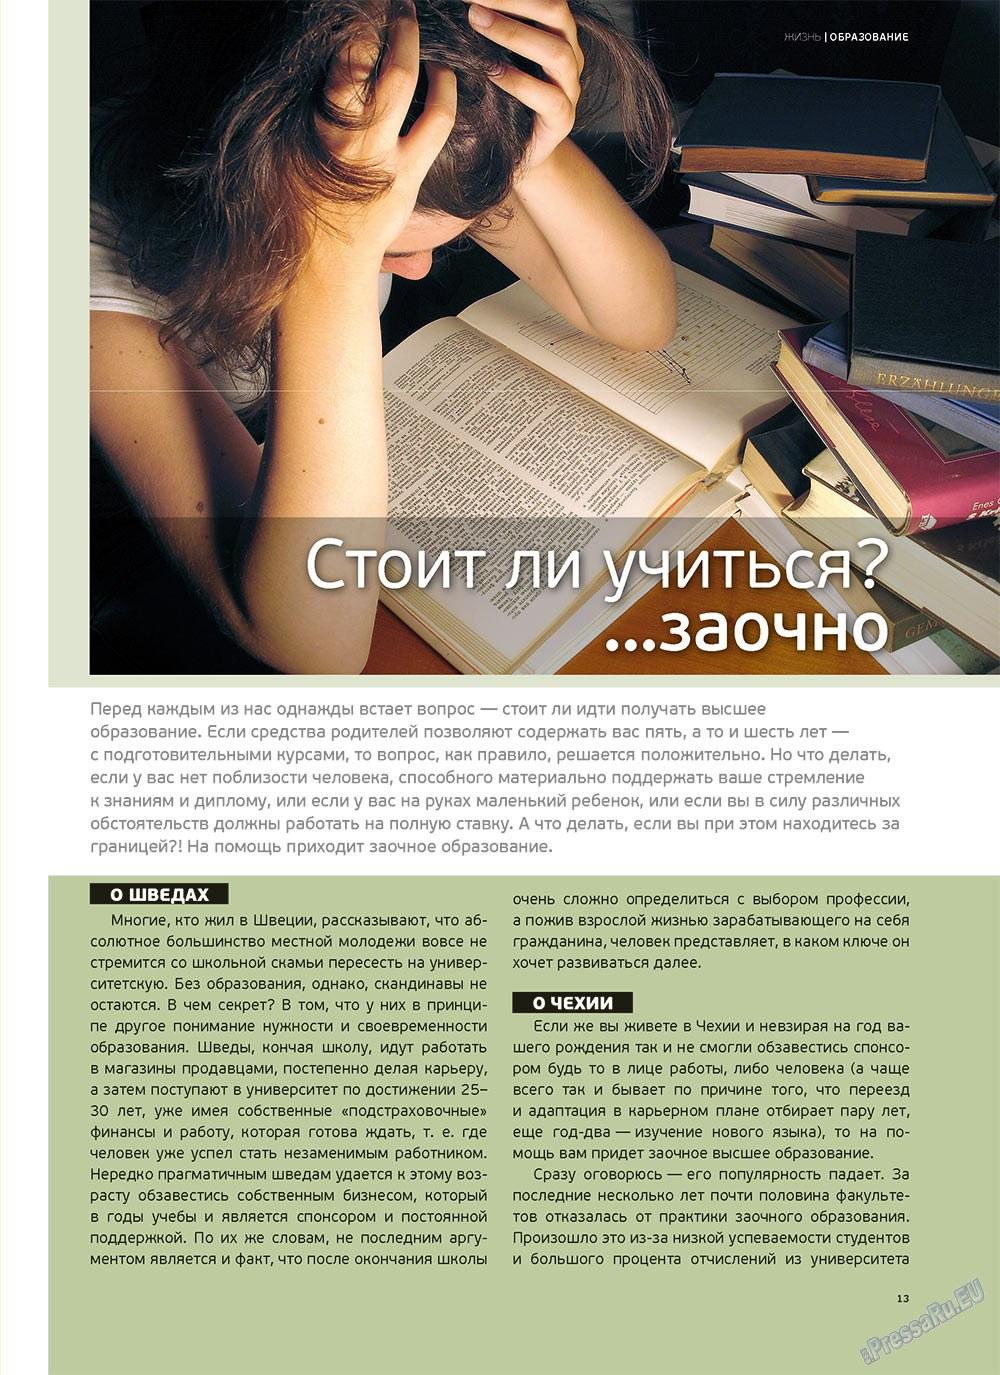 Артек (журнал). 2012 год, номер 6, стр. 15